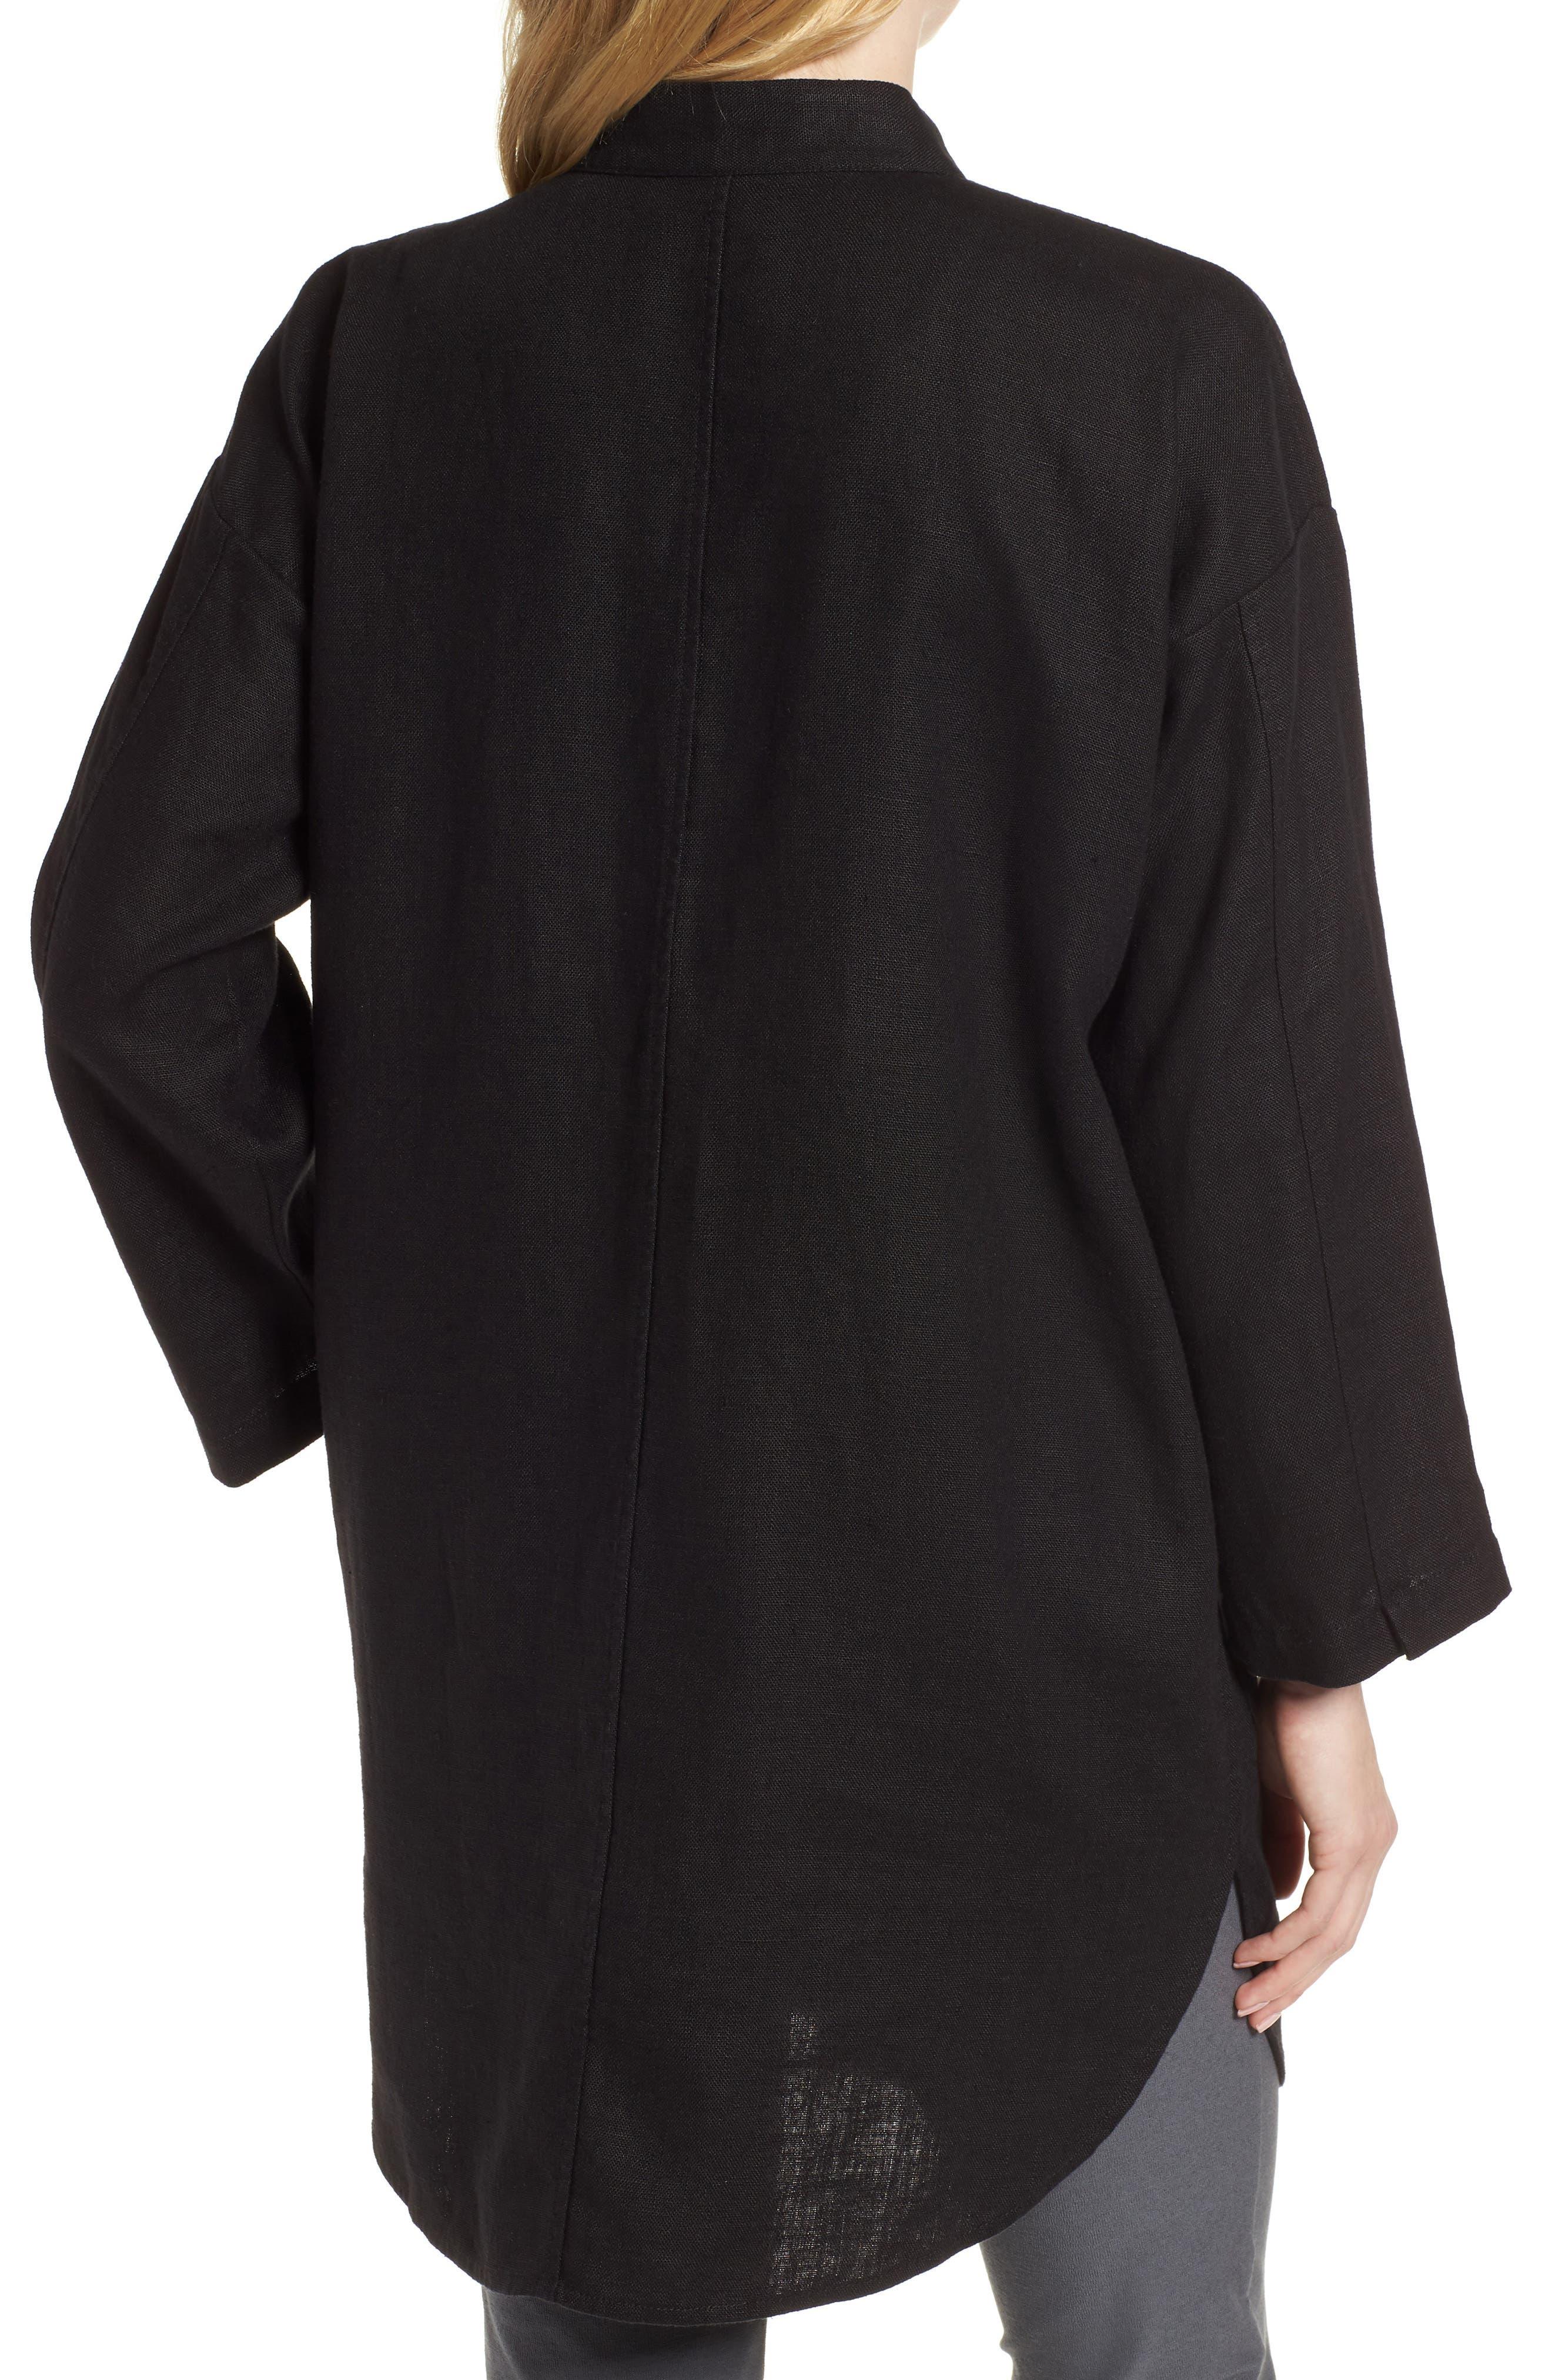 Organic Linen Jacket,                             Alternate thumbnail 2, color,                             001